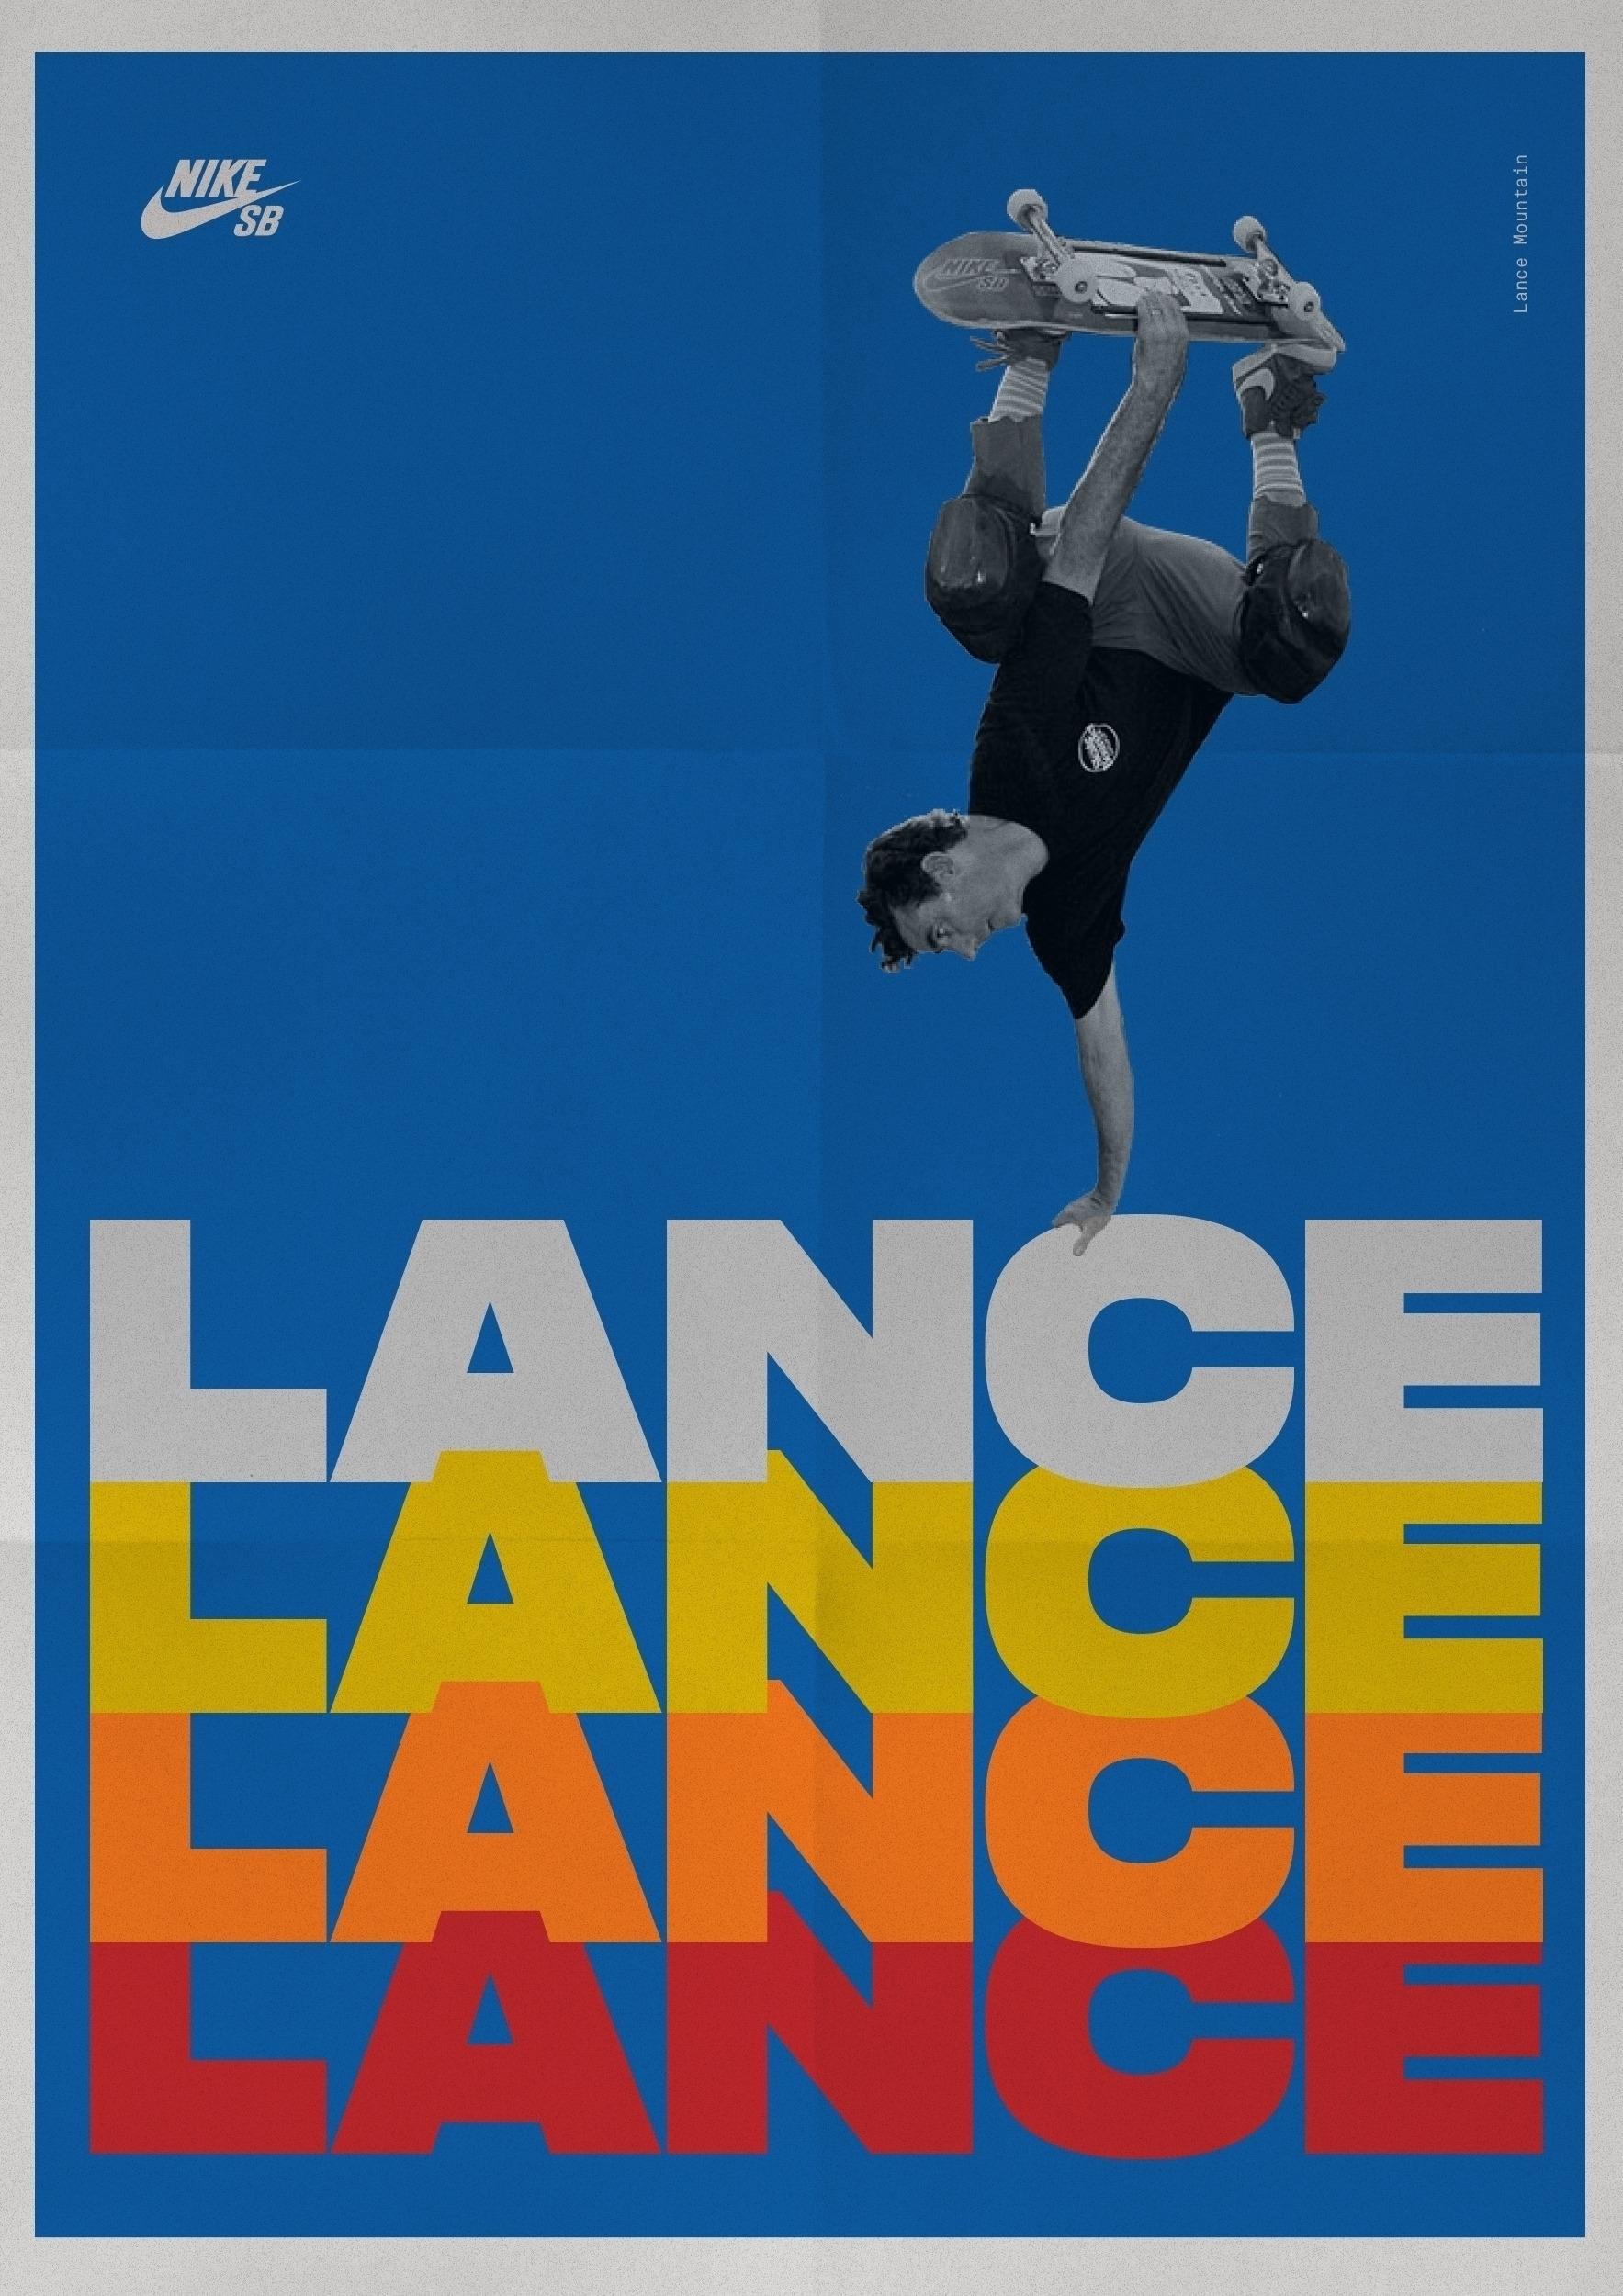 Lance Mountain Nike SB - luiscoderque | ello